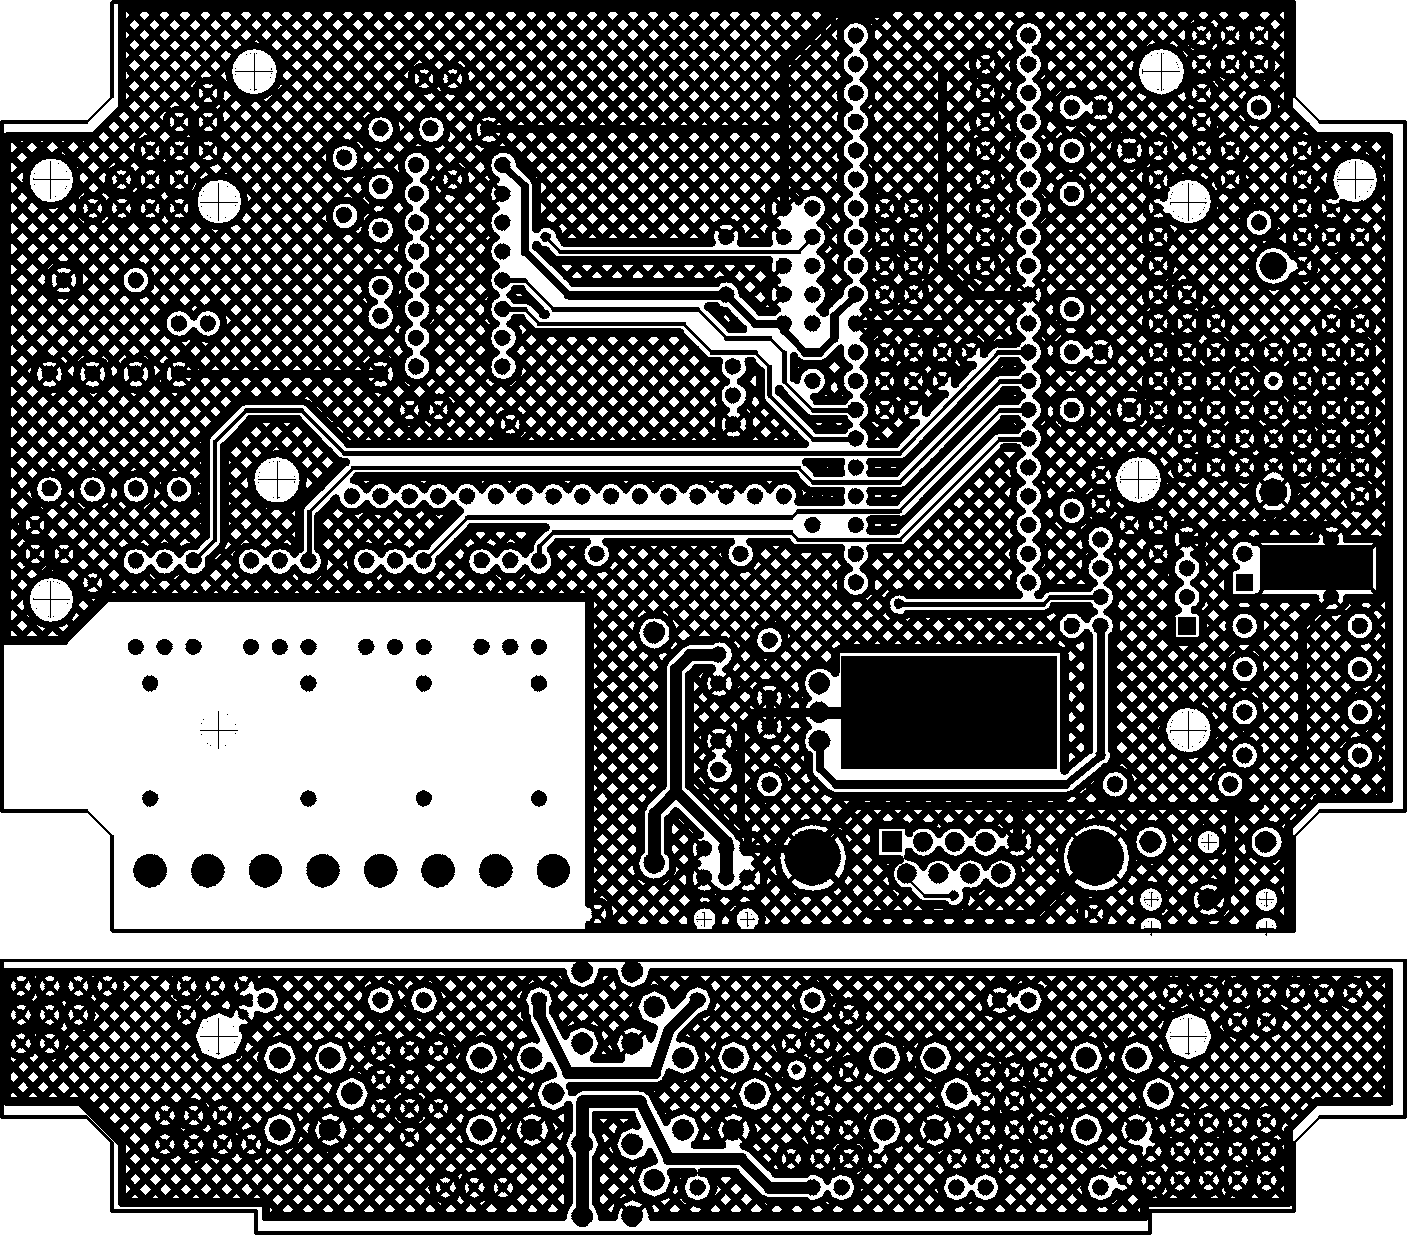 схема и прошивка терморегулятора